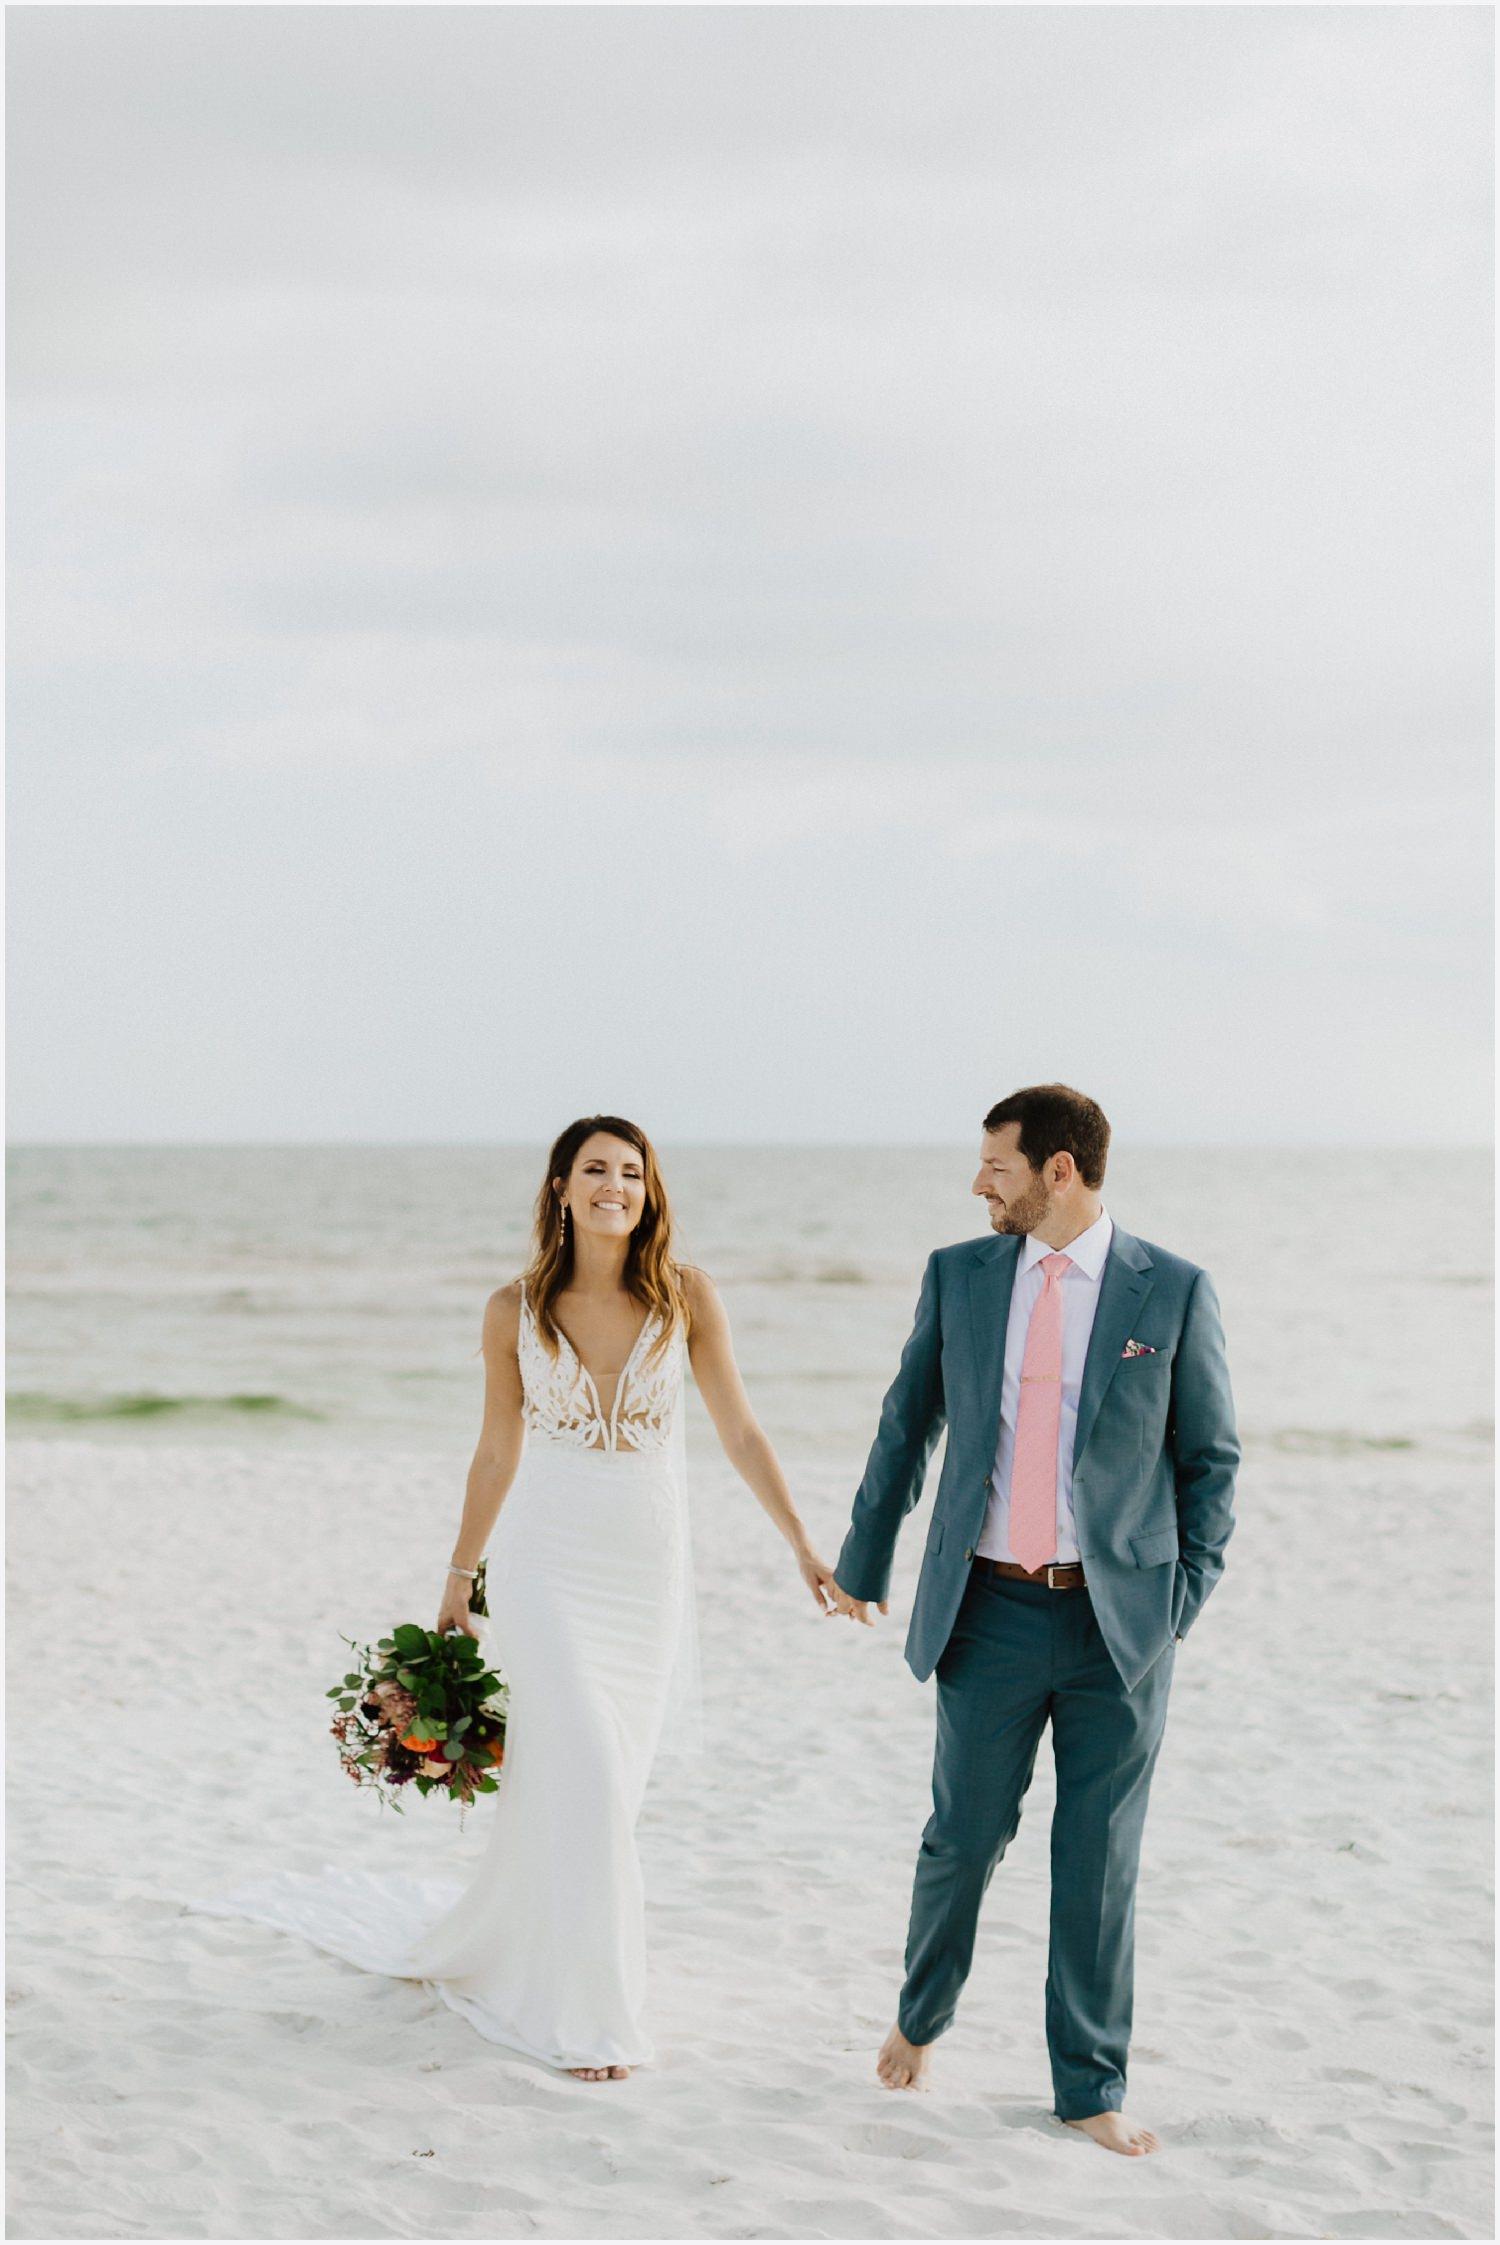 Bride and groom walking on Rosemary Beach